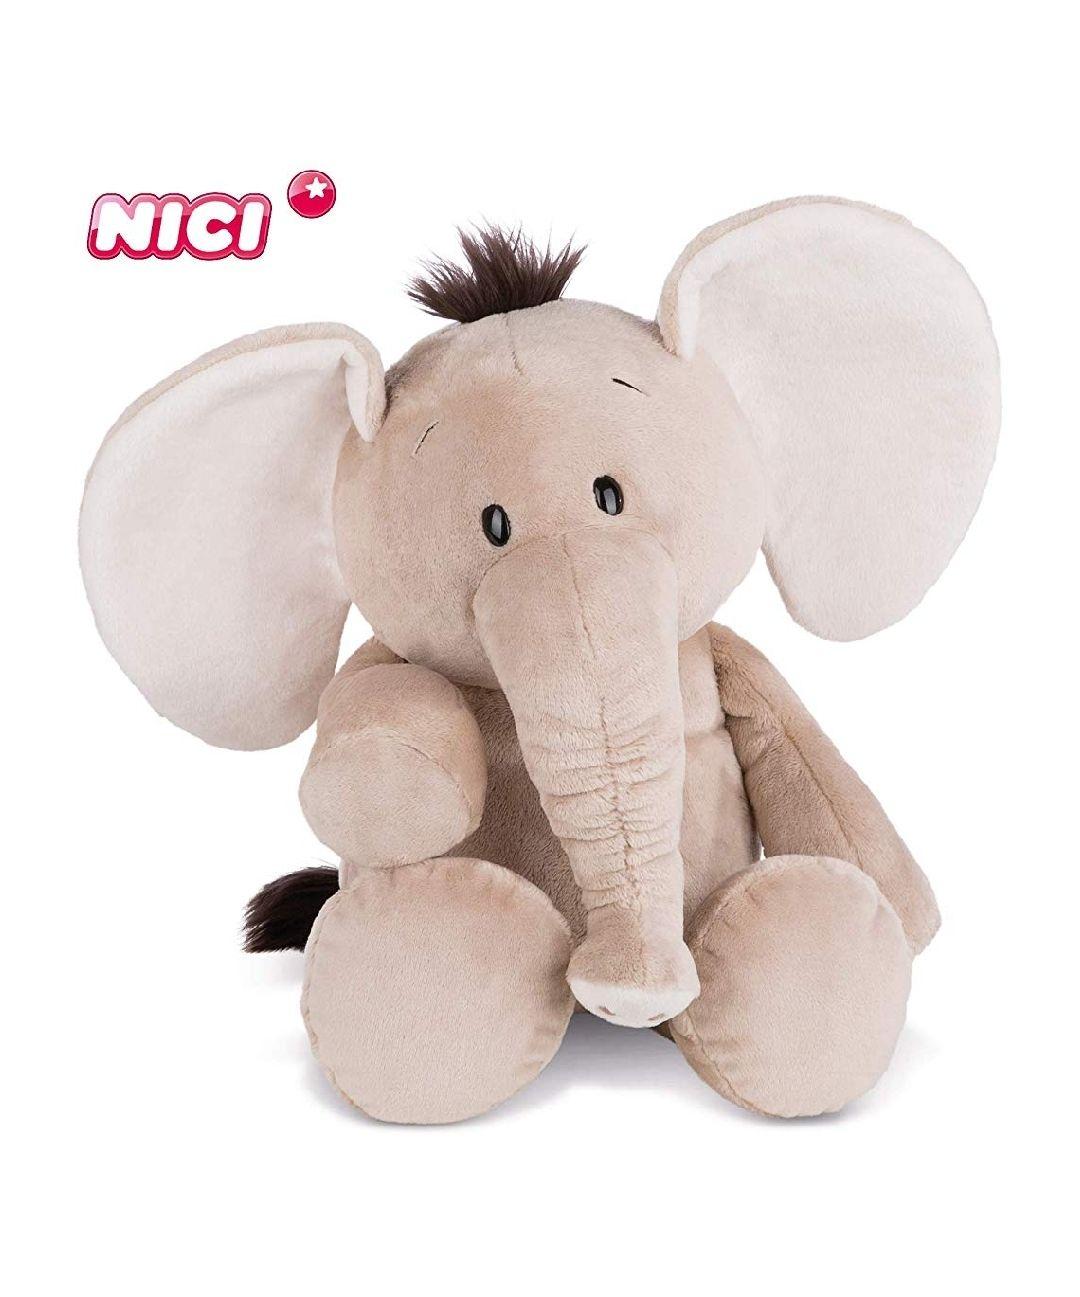 NICI Plüschtier Crazy Friday Elefant 50 cm